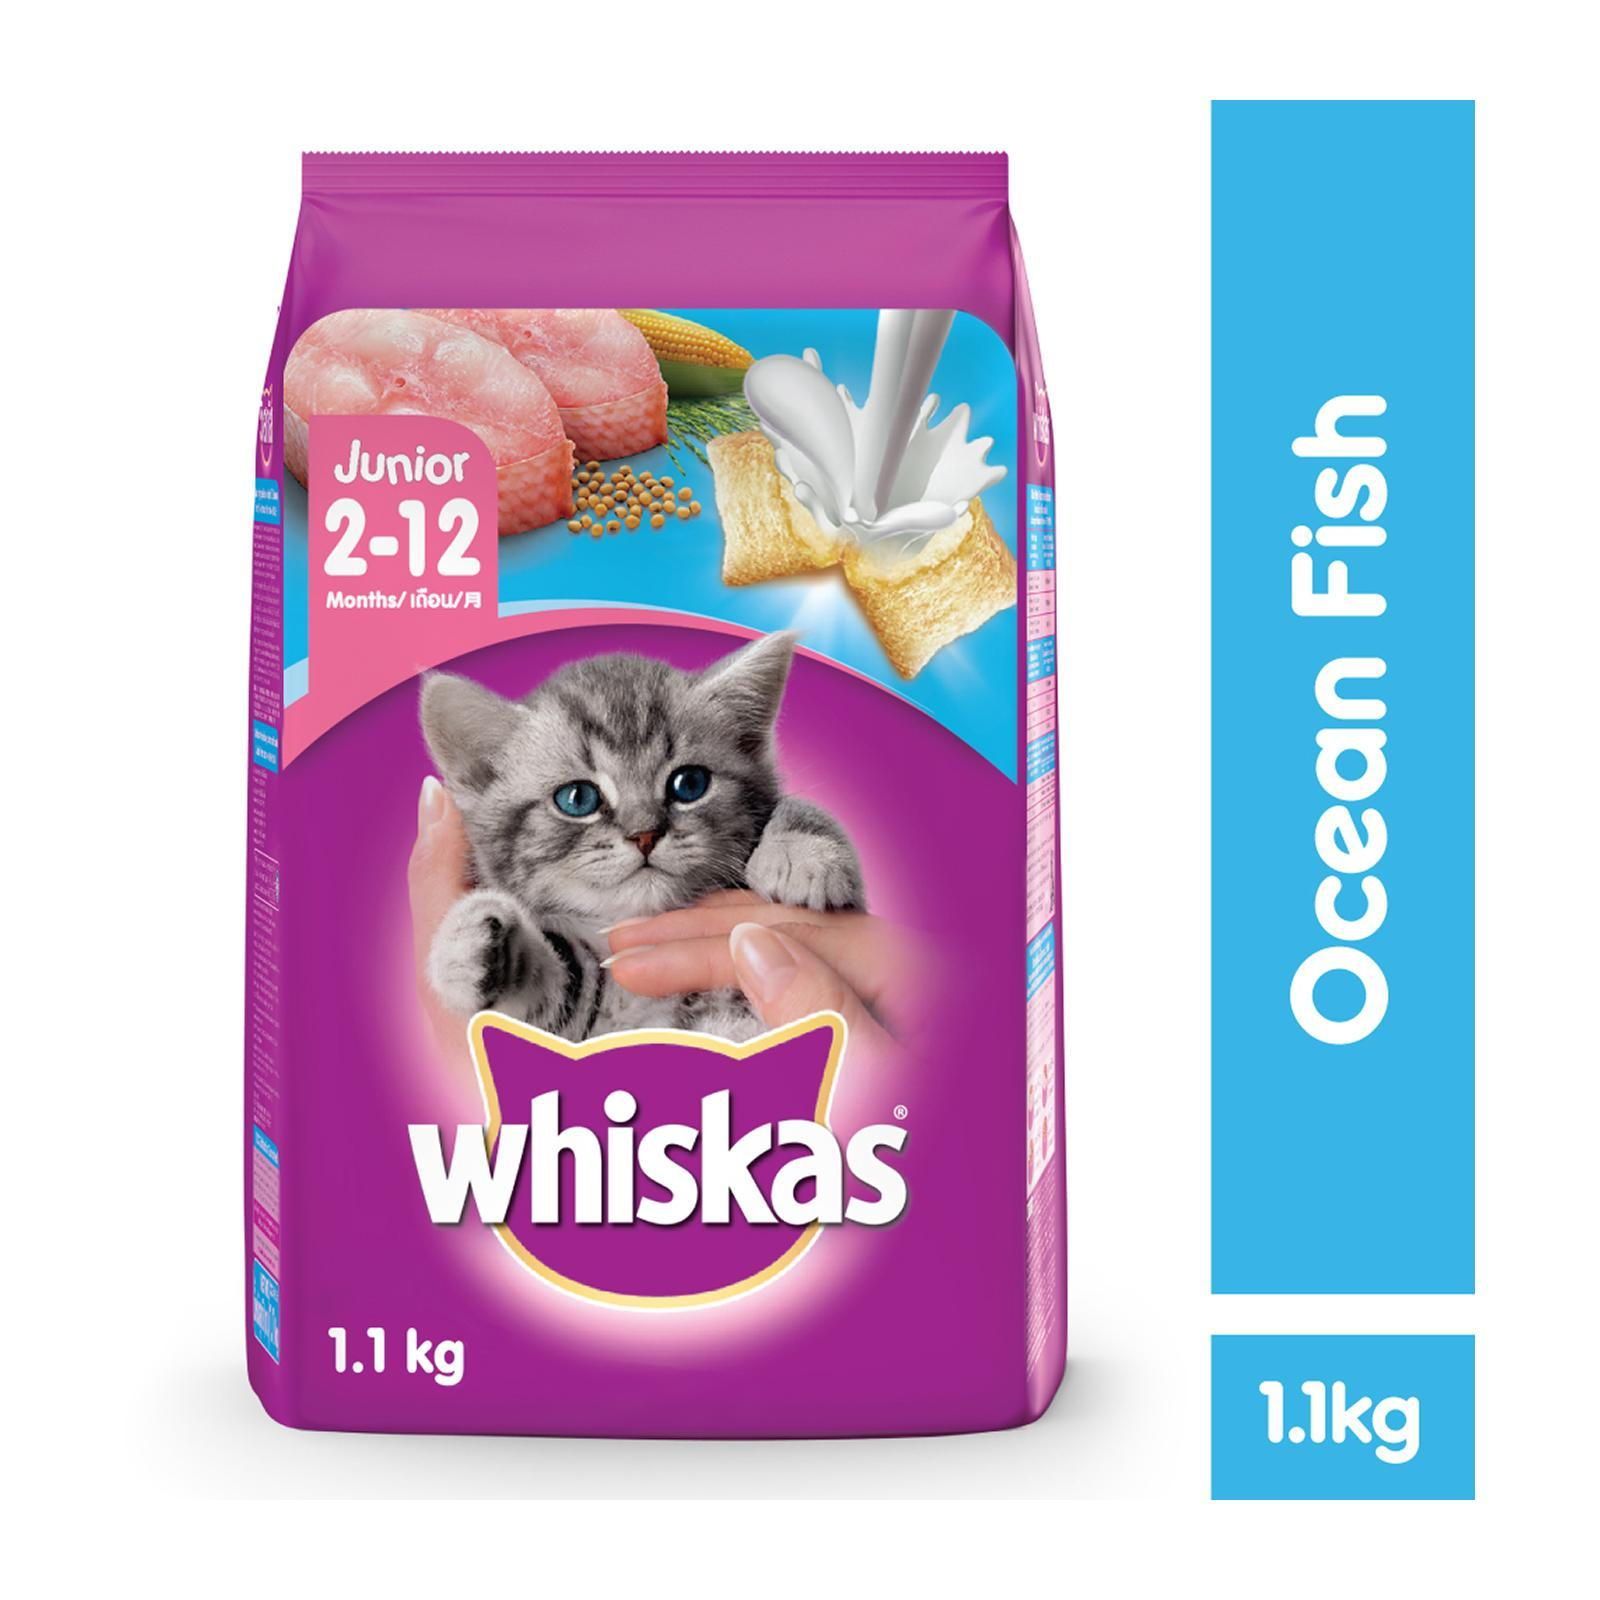 WHISKAS Junior Ocean Fish with Milk Dry Cat Food